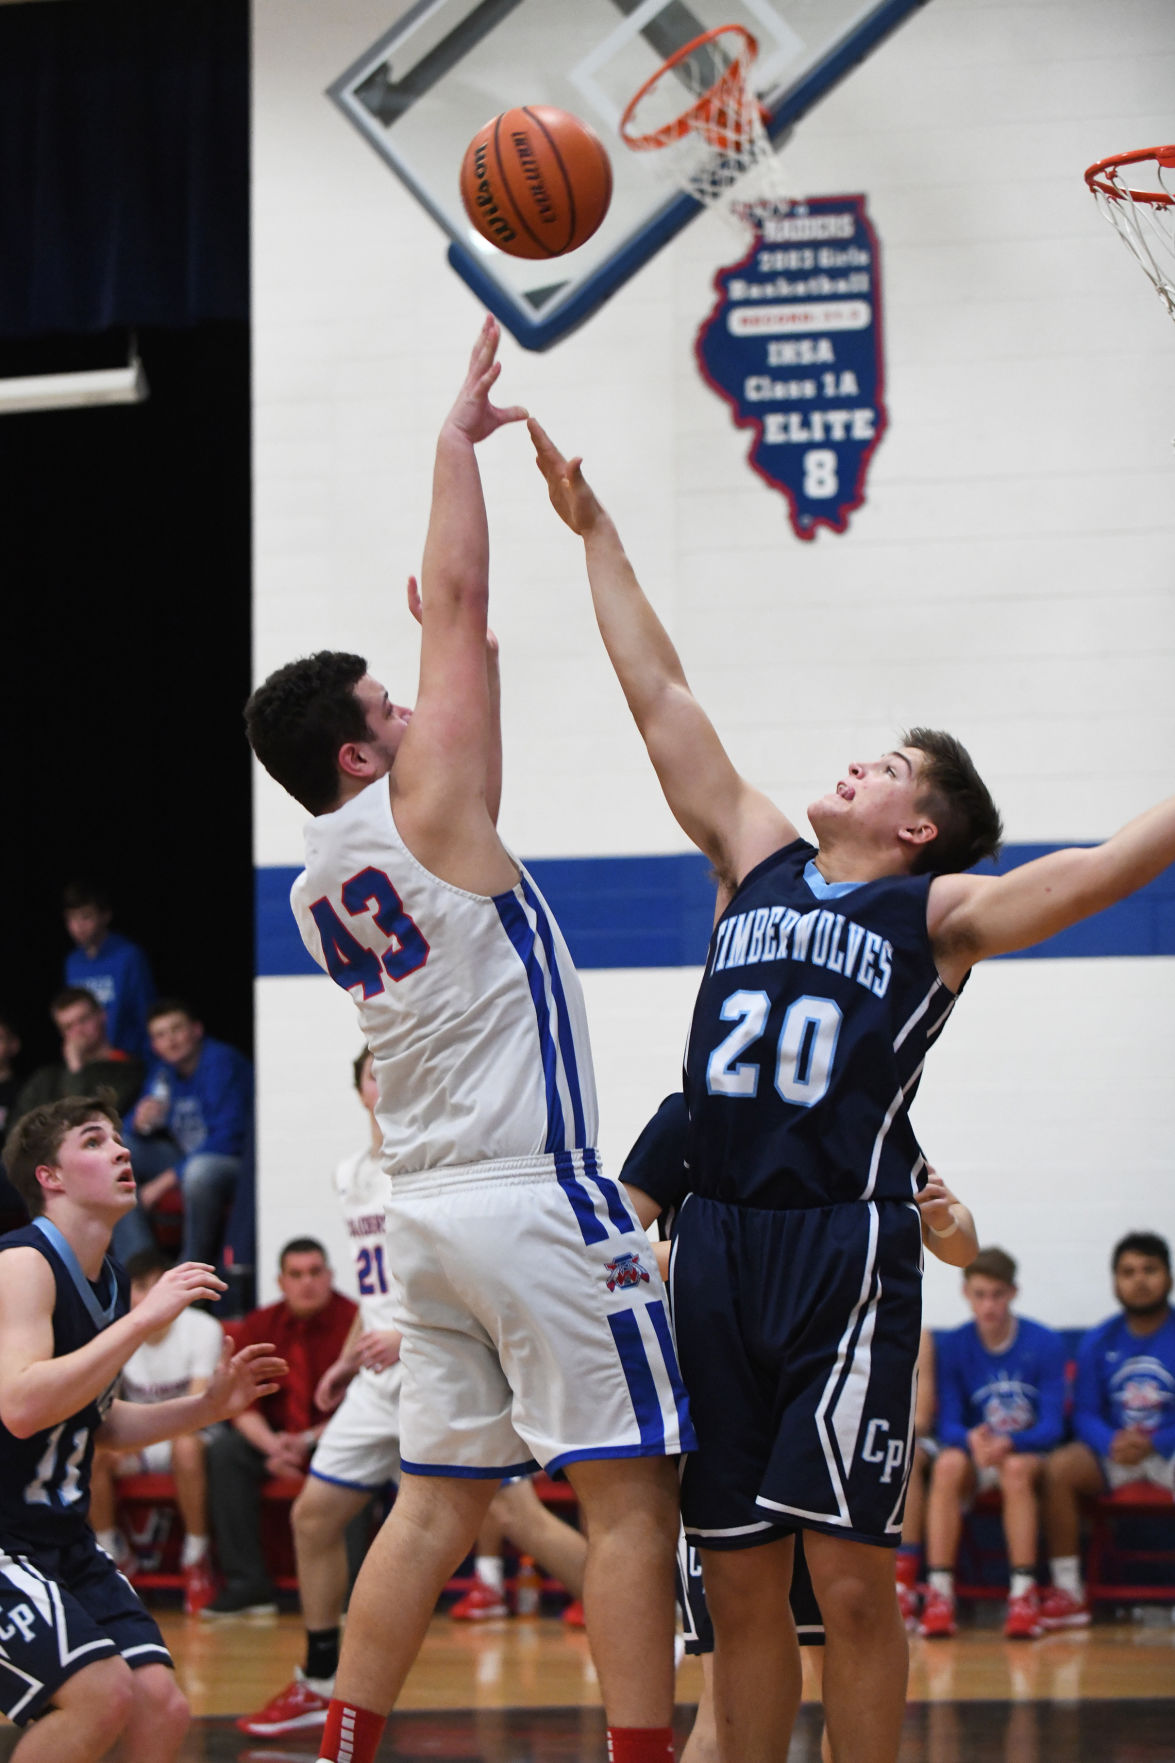 Boys Basketball: Iroquois West vs. Cissna Park